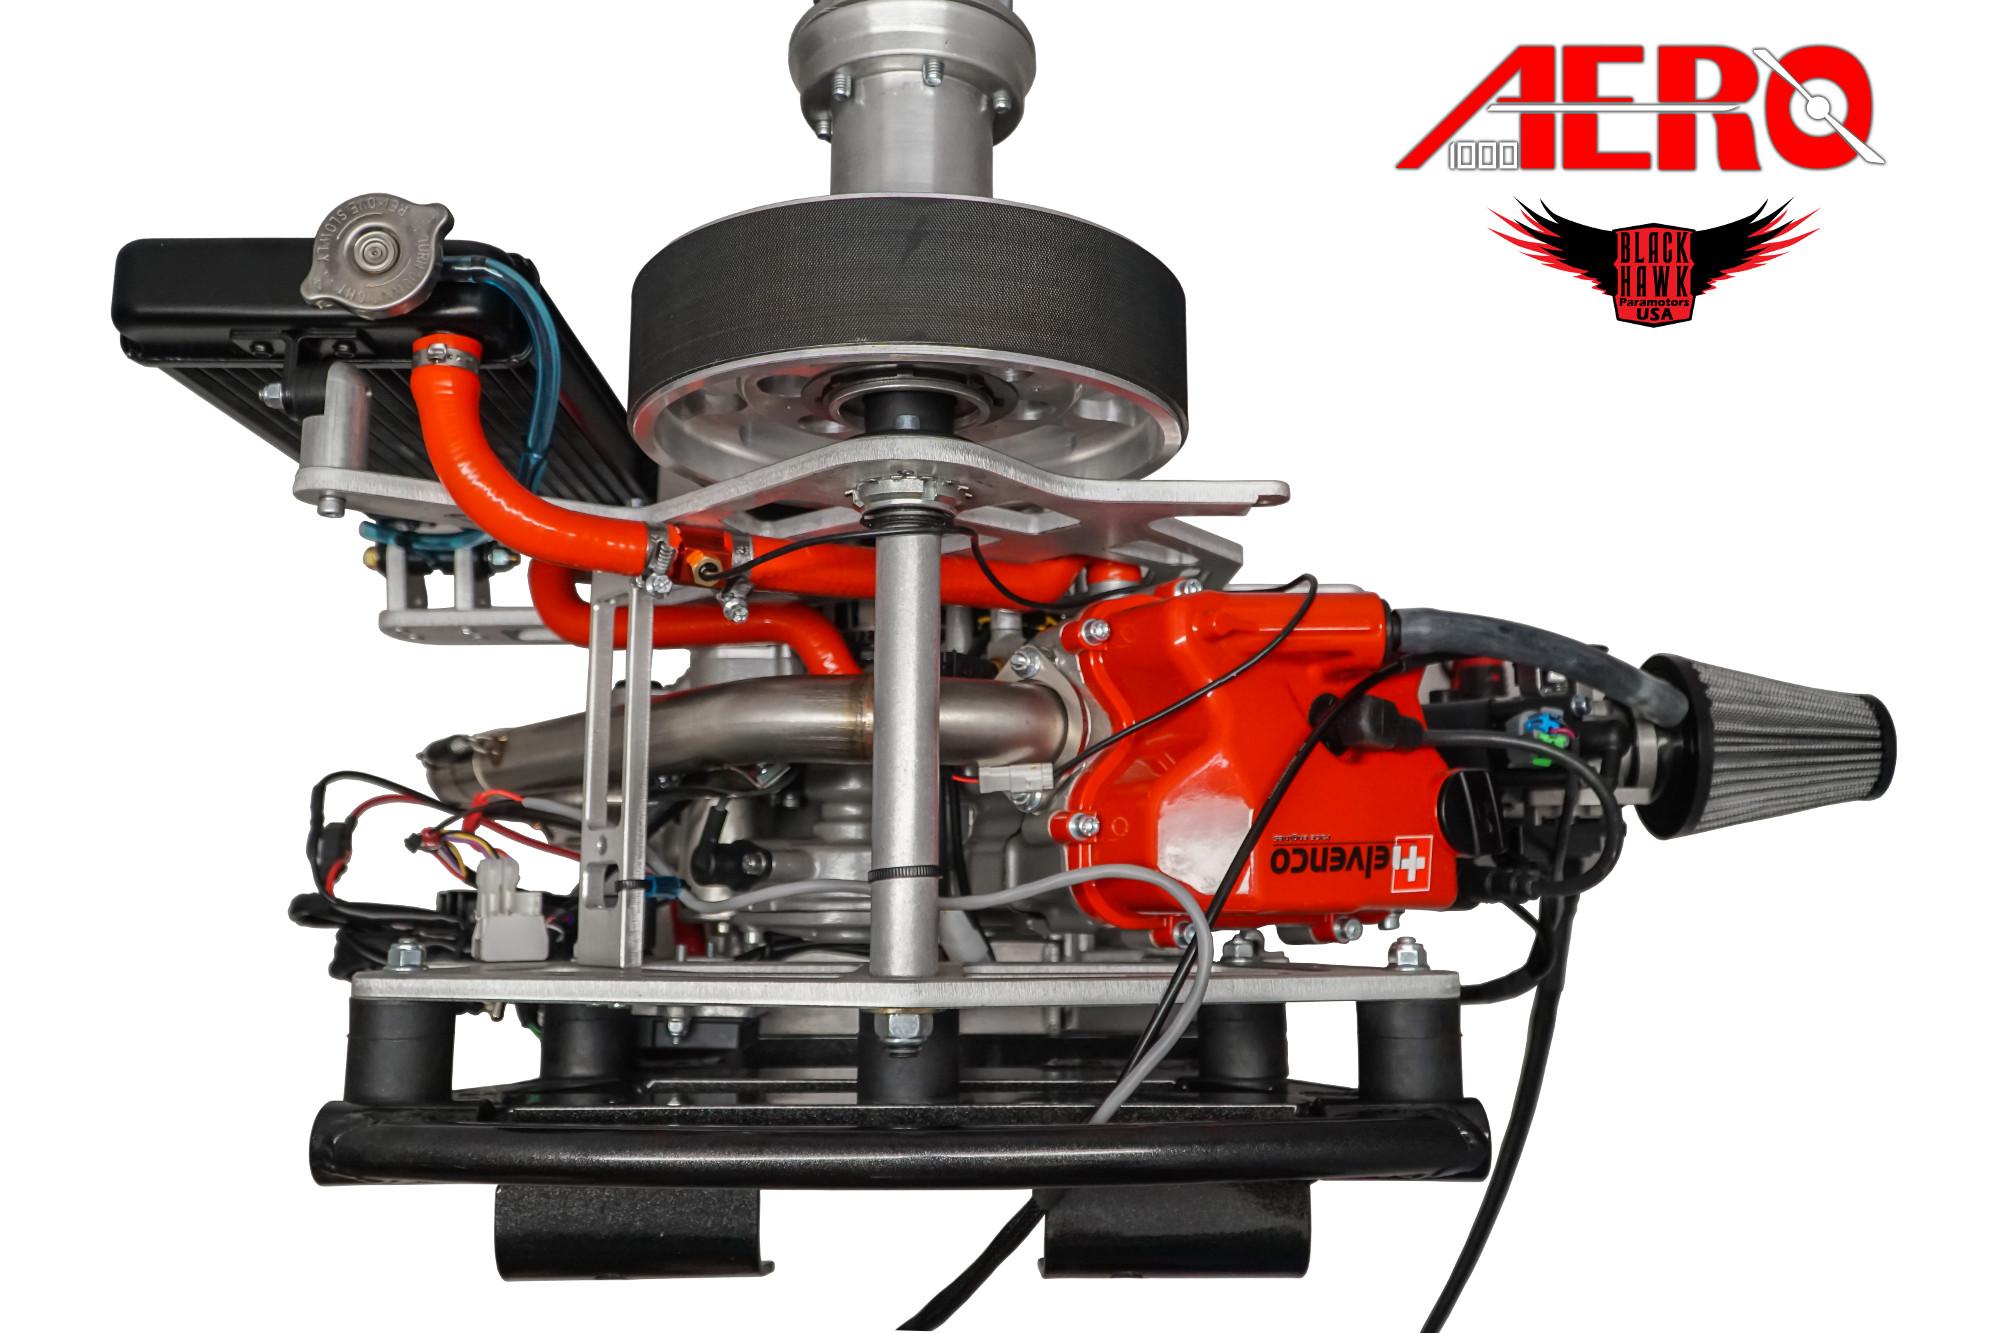 Aero 1000 4 Stroke Paramotor BlackHawk NEW 2019